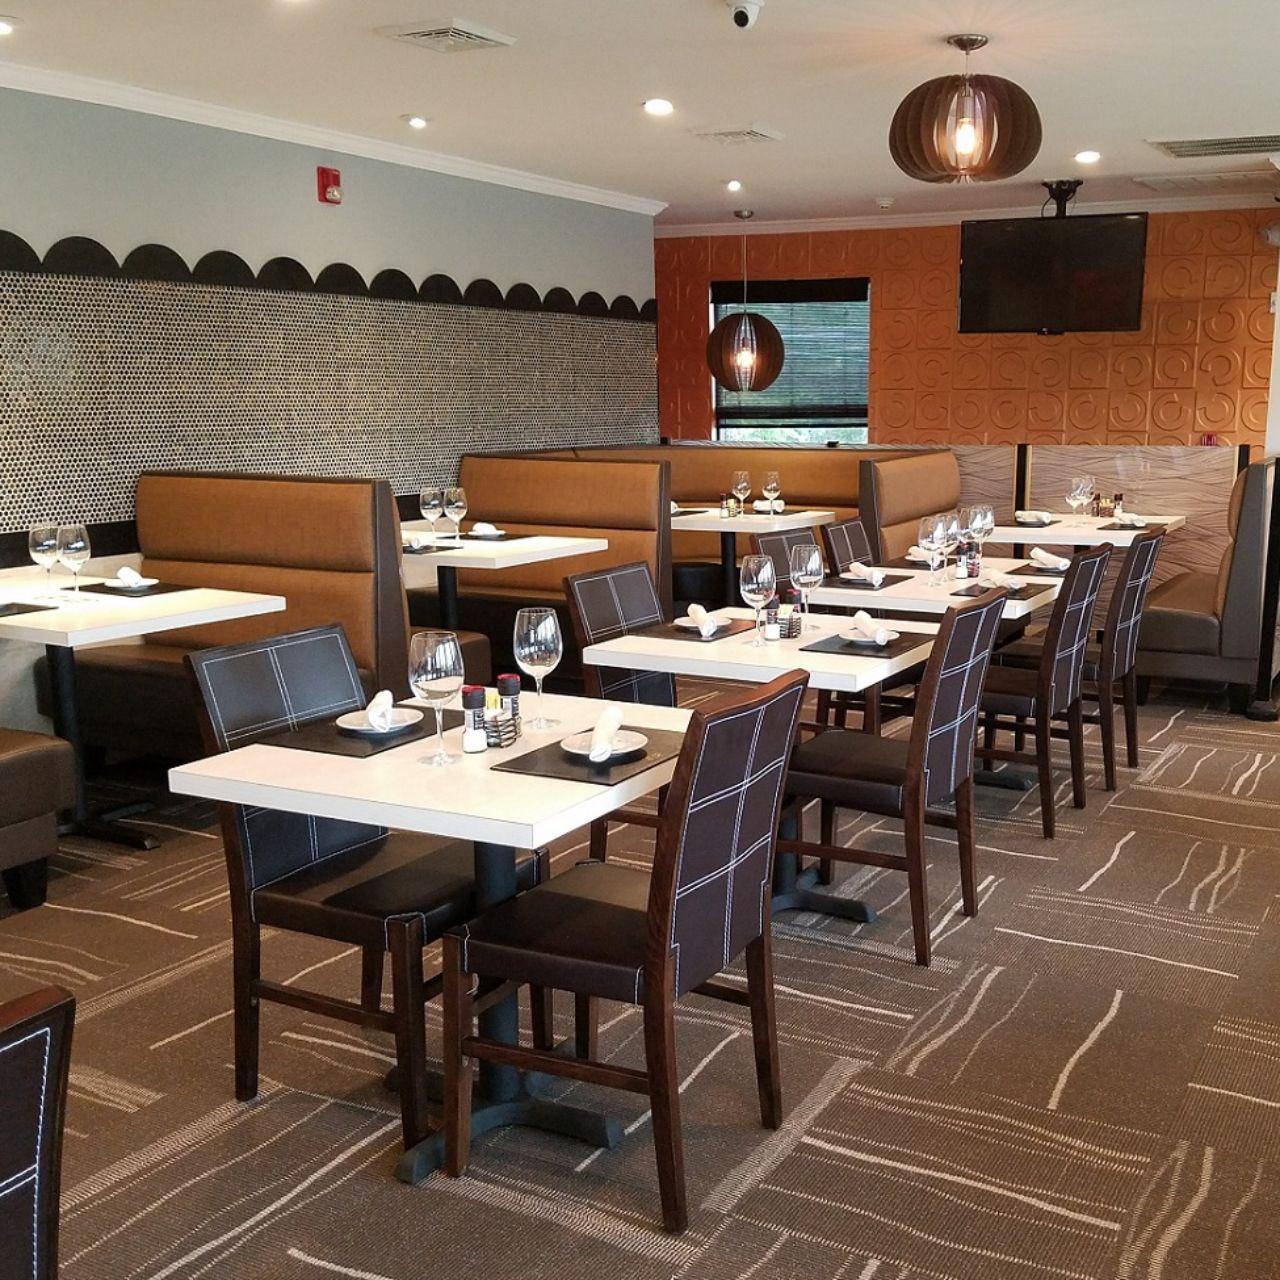 lehigh valley hardwood flooring allentown pa of vivo italian kitchen restaurant allentown pa opentable inside 25188455